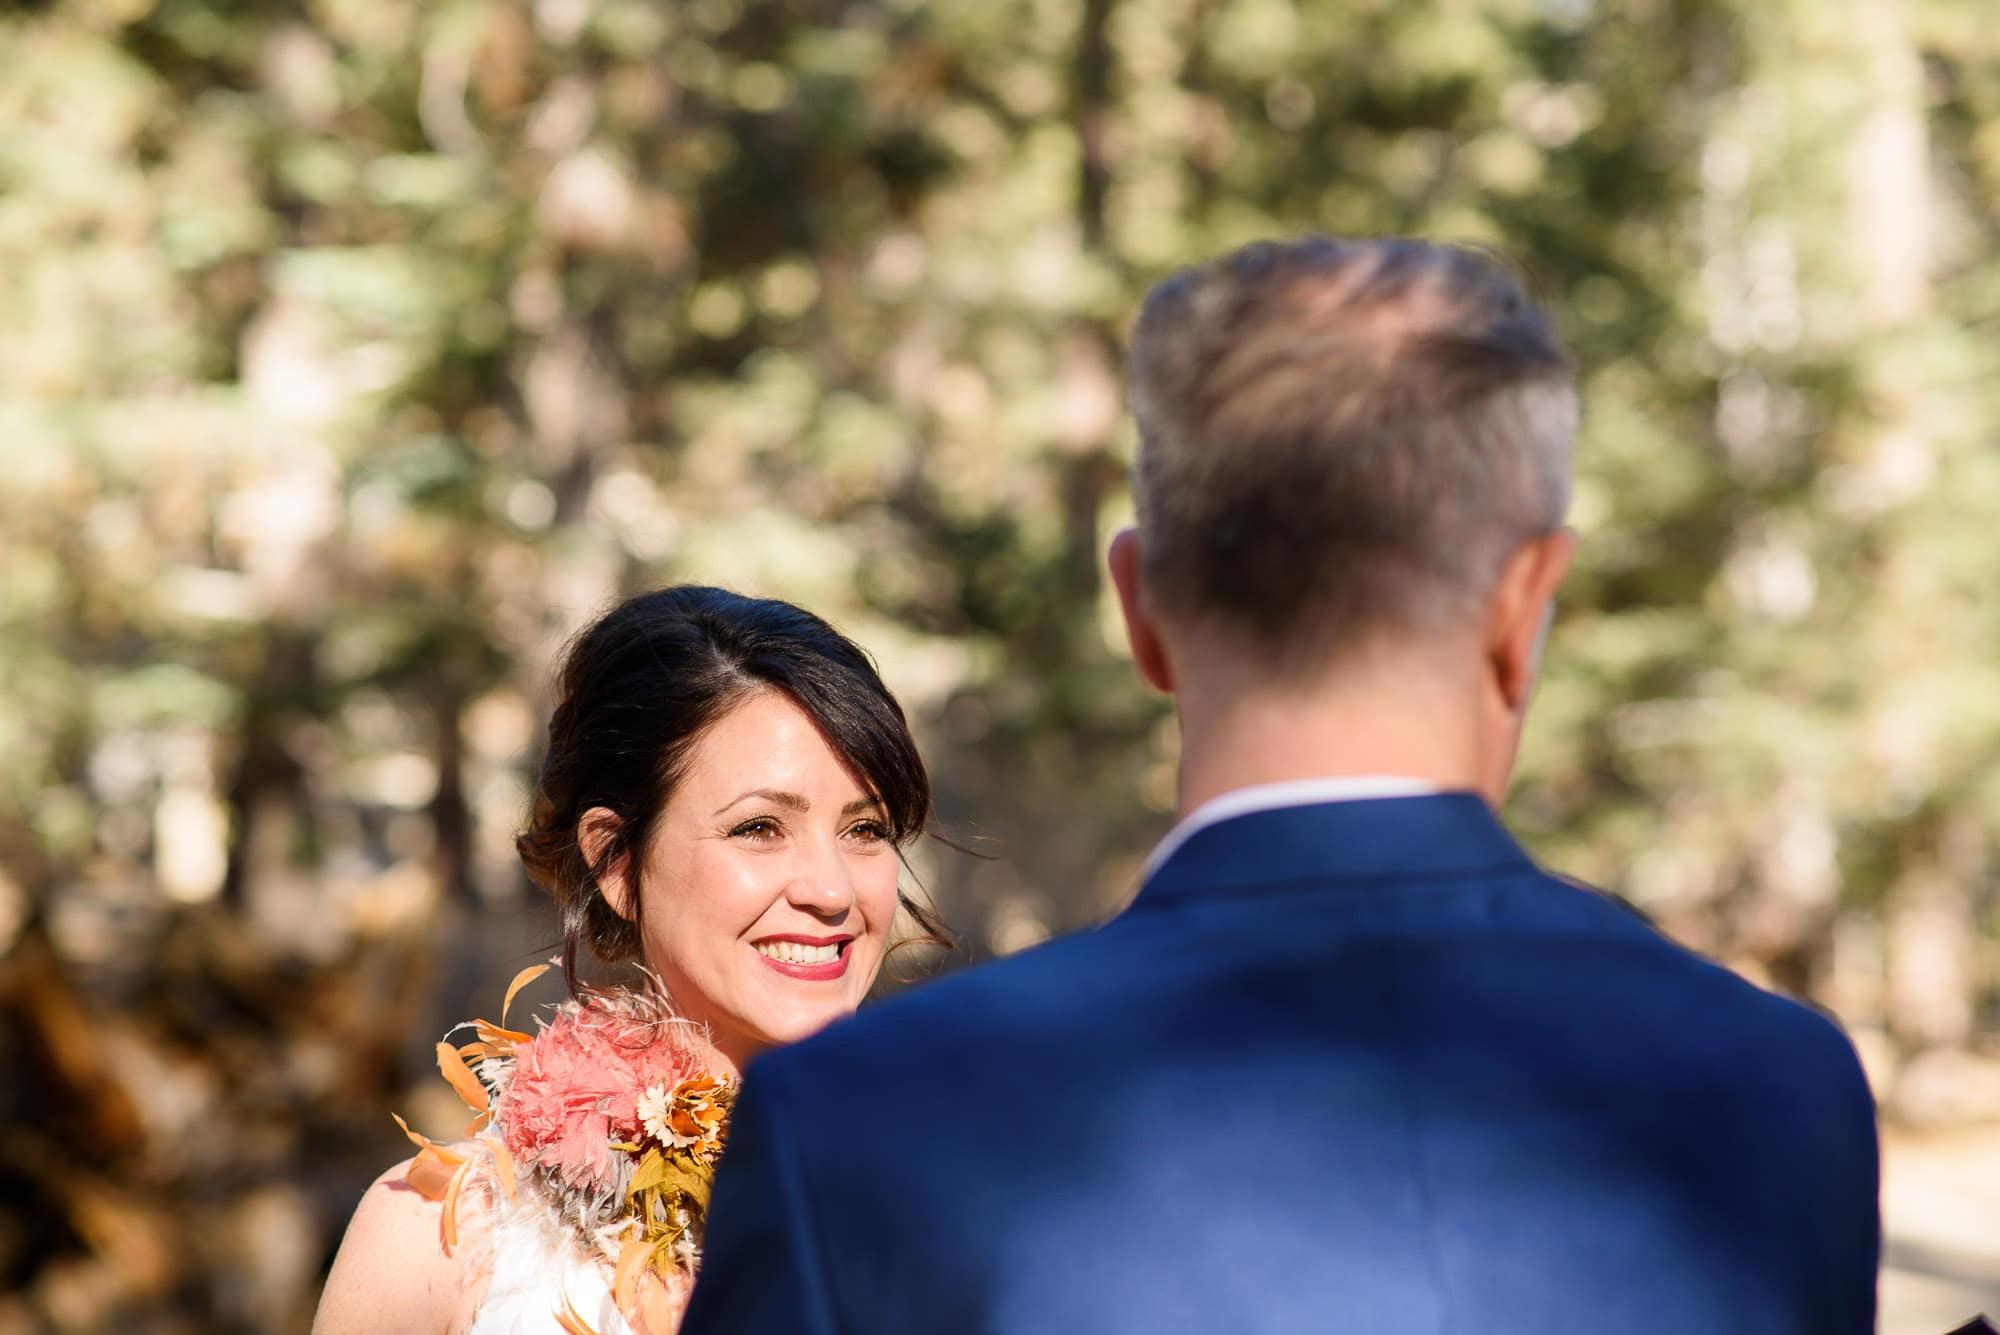 010_Alan_and_Heidi_Palm_Springs_Tram_Wedding